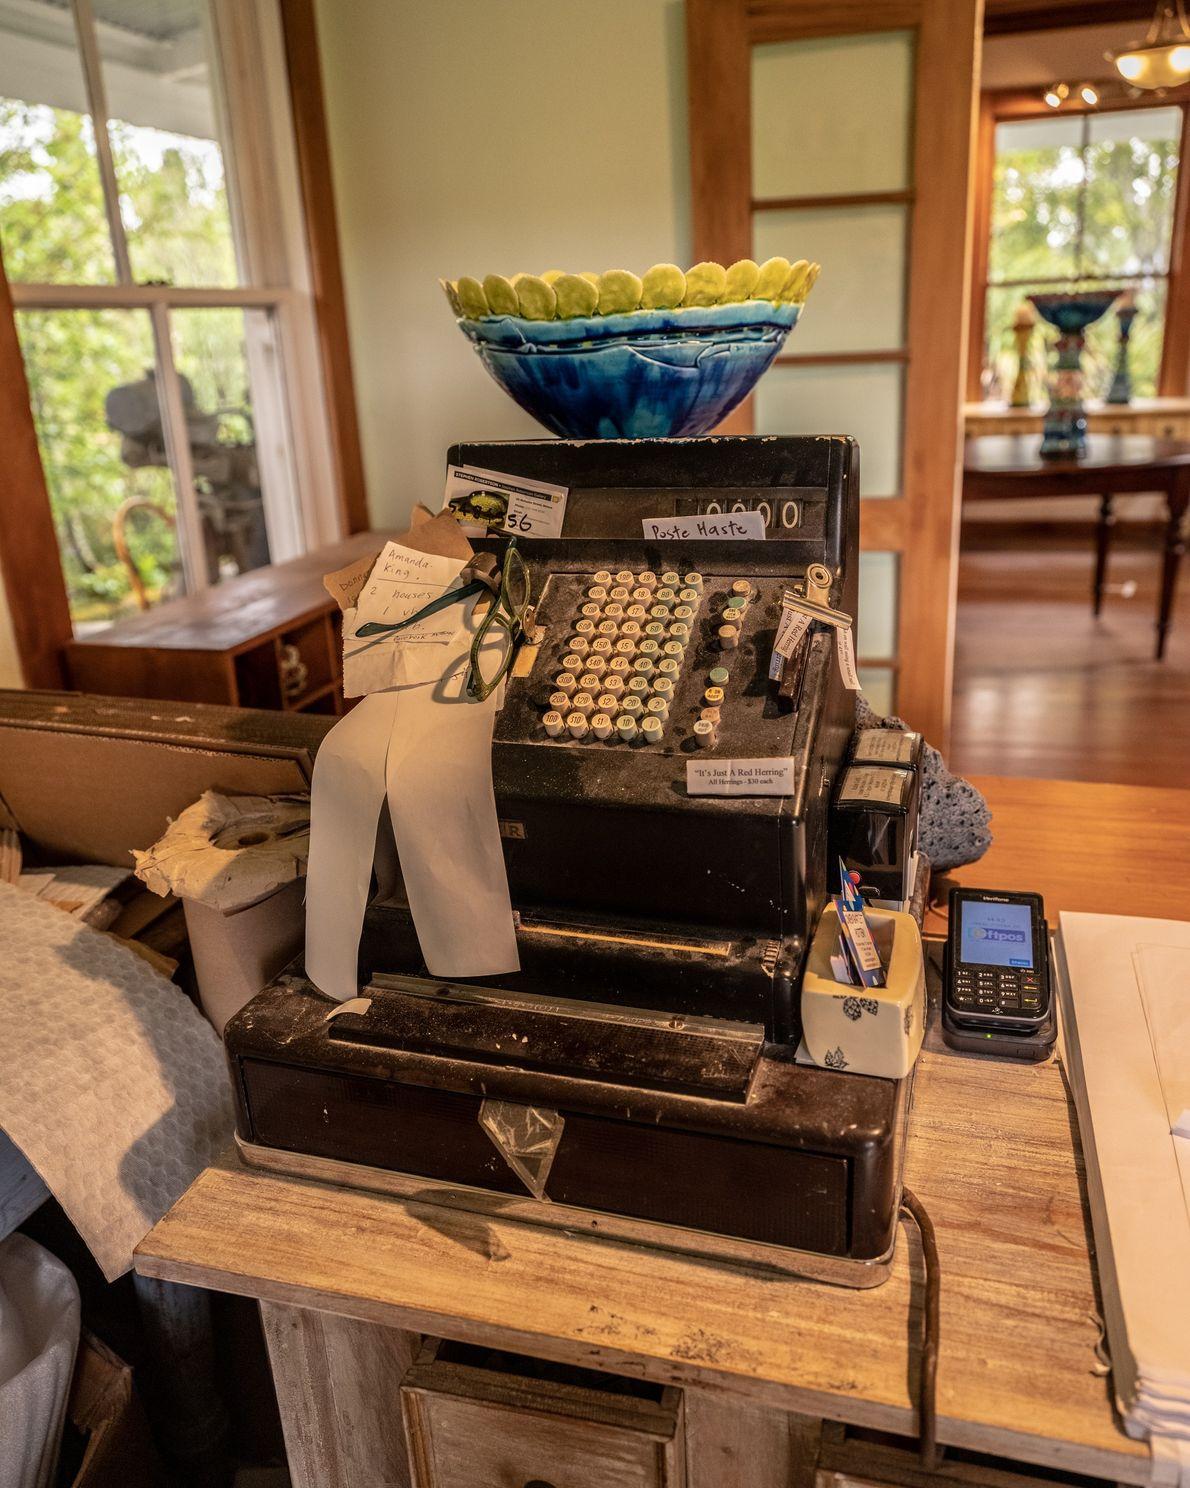 turismo-nova-zelandia-dois-nelson-wineries-tasman-antiga-loja-agencia-correio